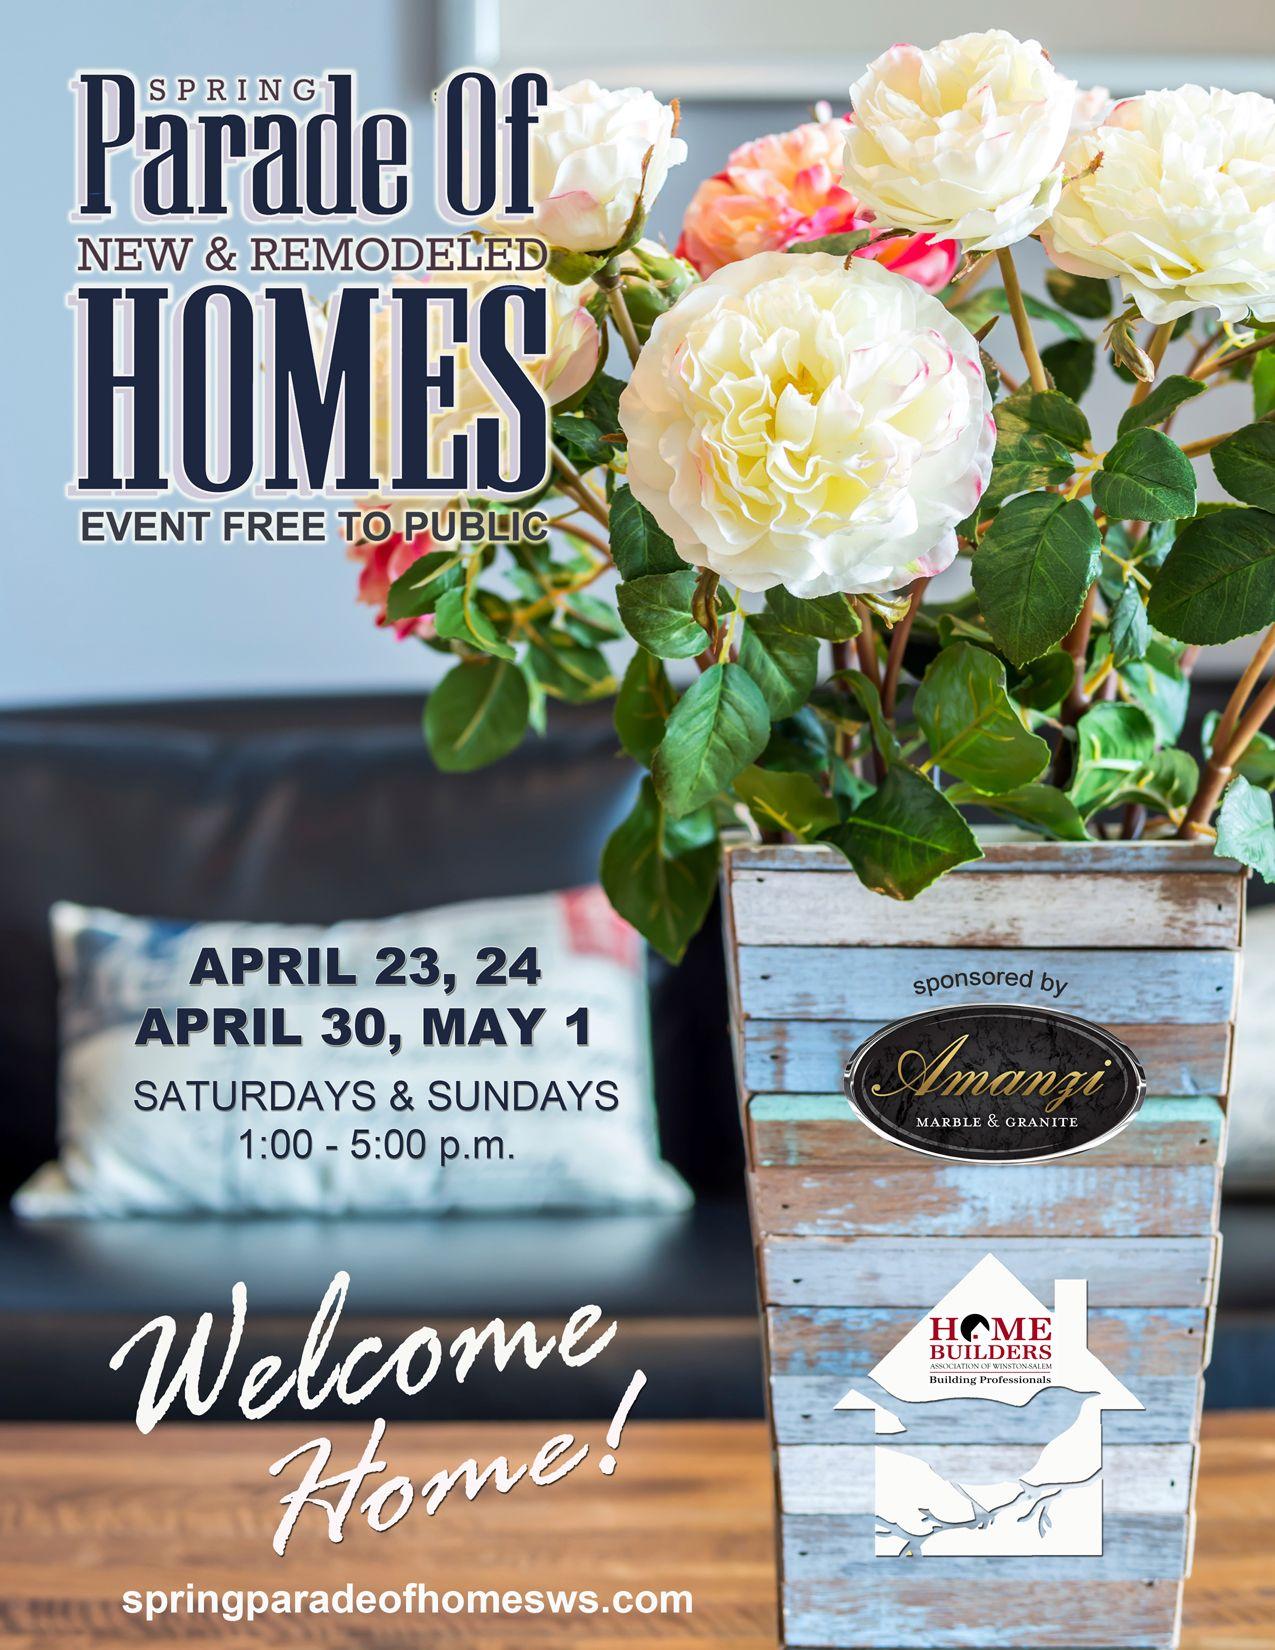 Spring Parade Of Homes April 23 24 And April 30 May 1 Home Builders Association Parade Of Homes North Carolina Homes